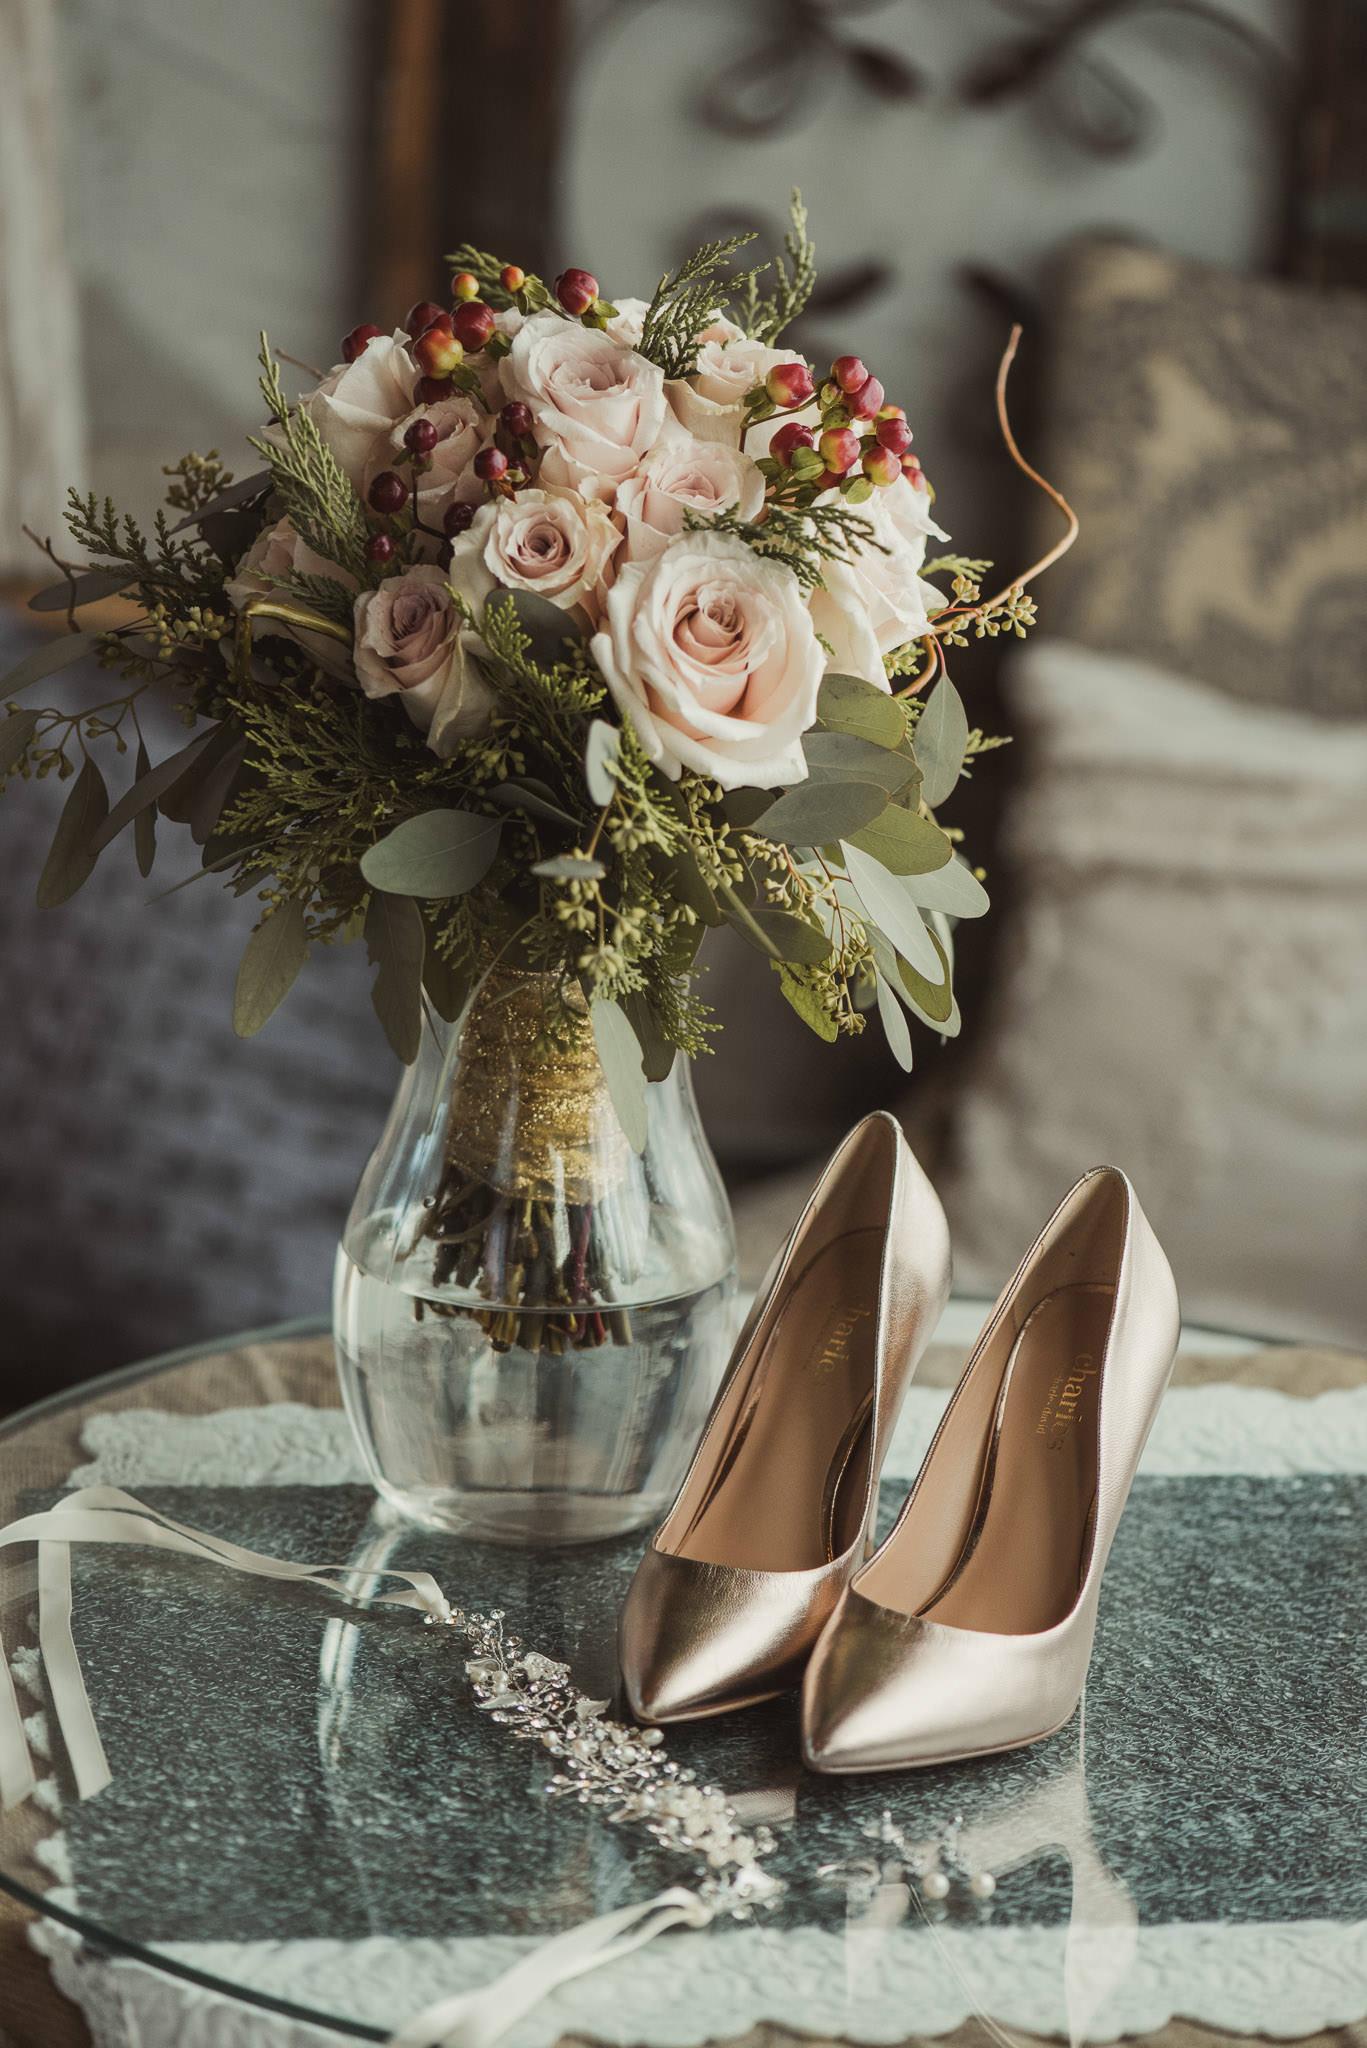 Cynthia-Curtis-Olde-Dobbine-Station-Houston-Wedding-Photographer-sm-14.jpg